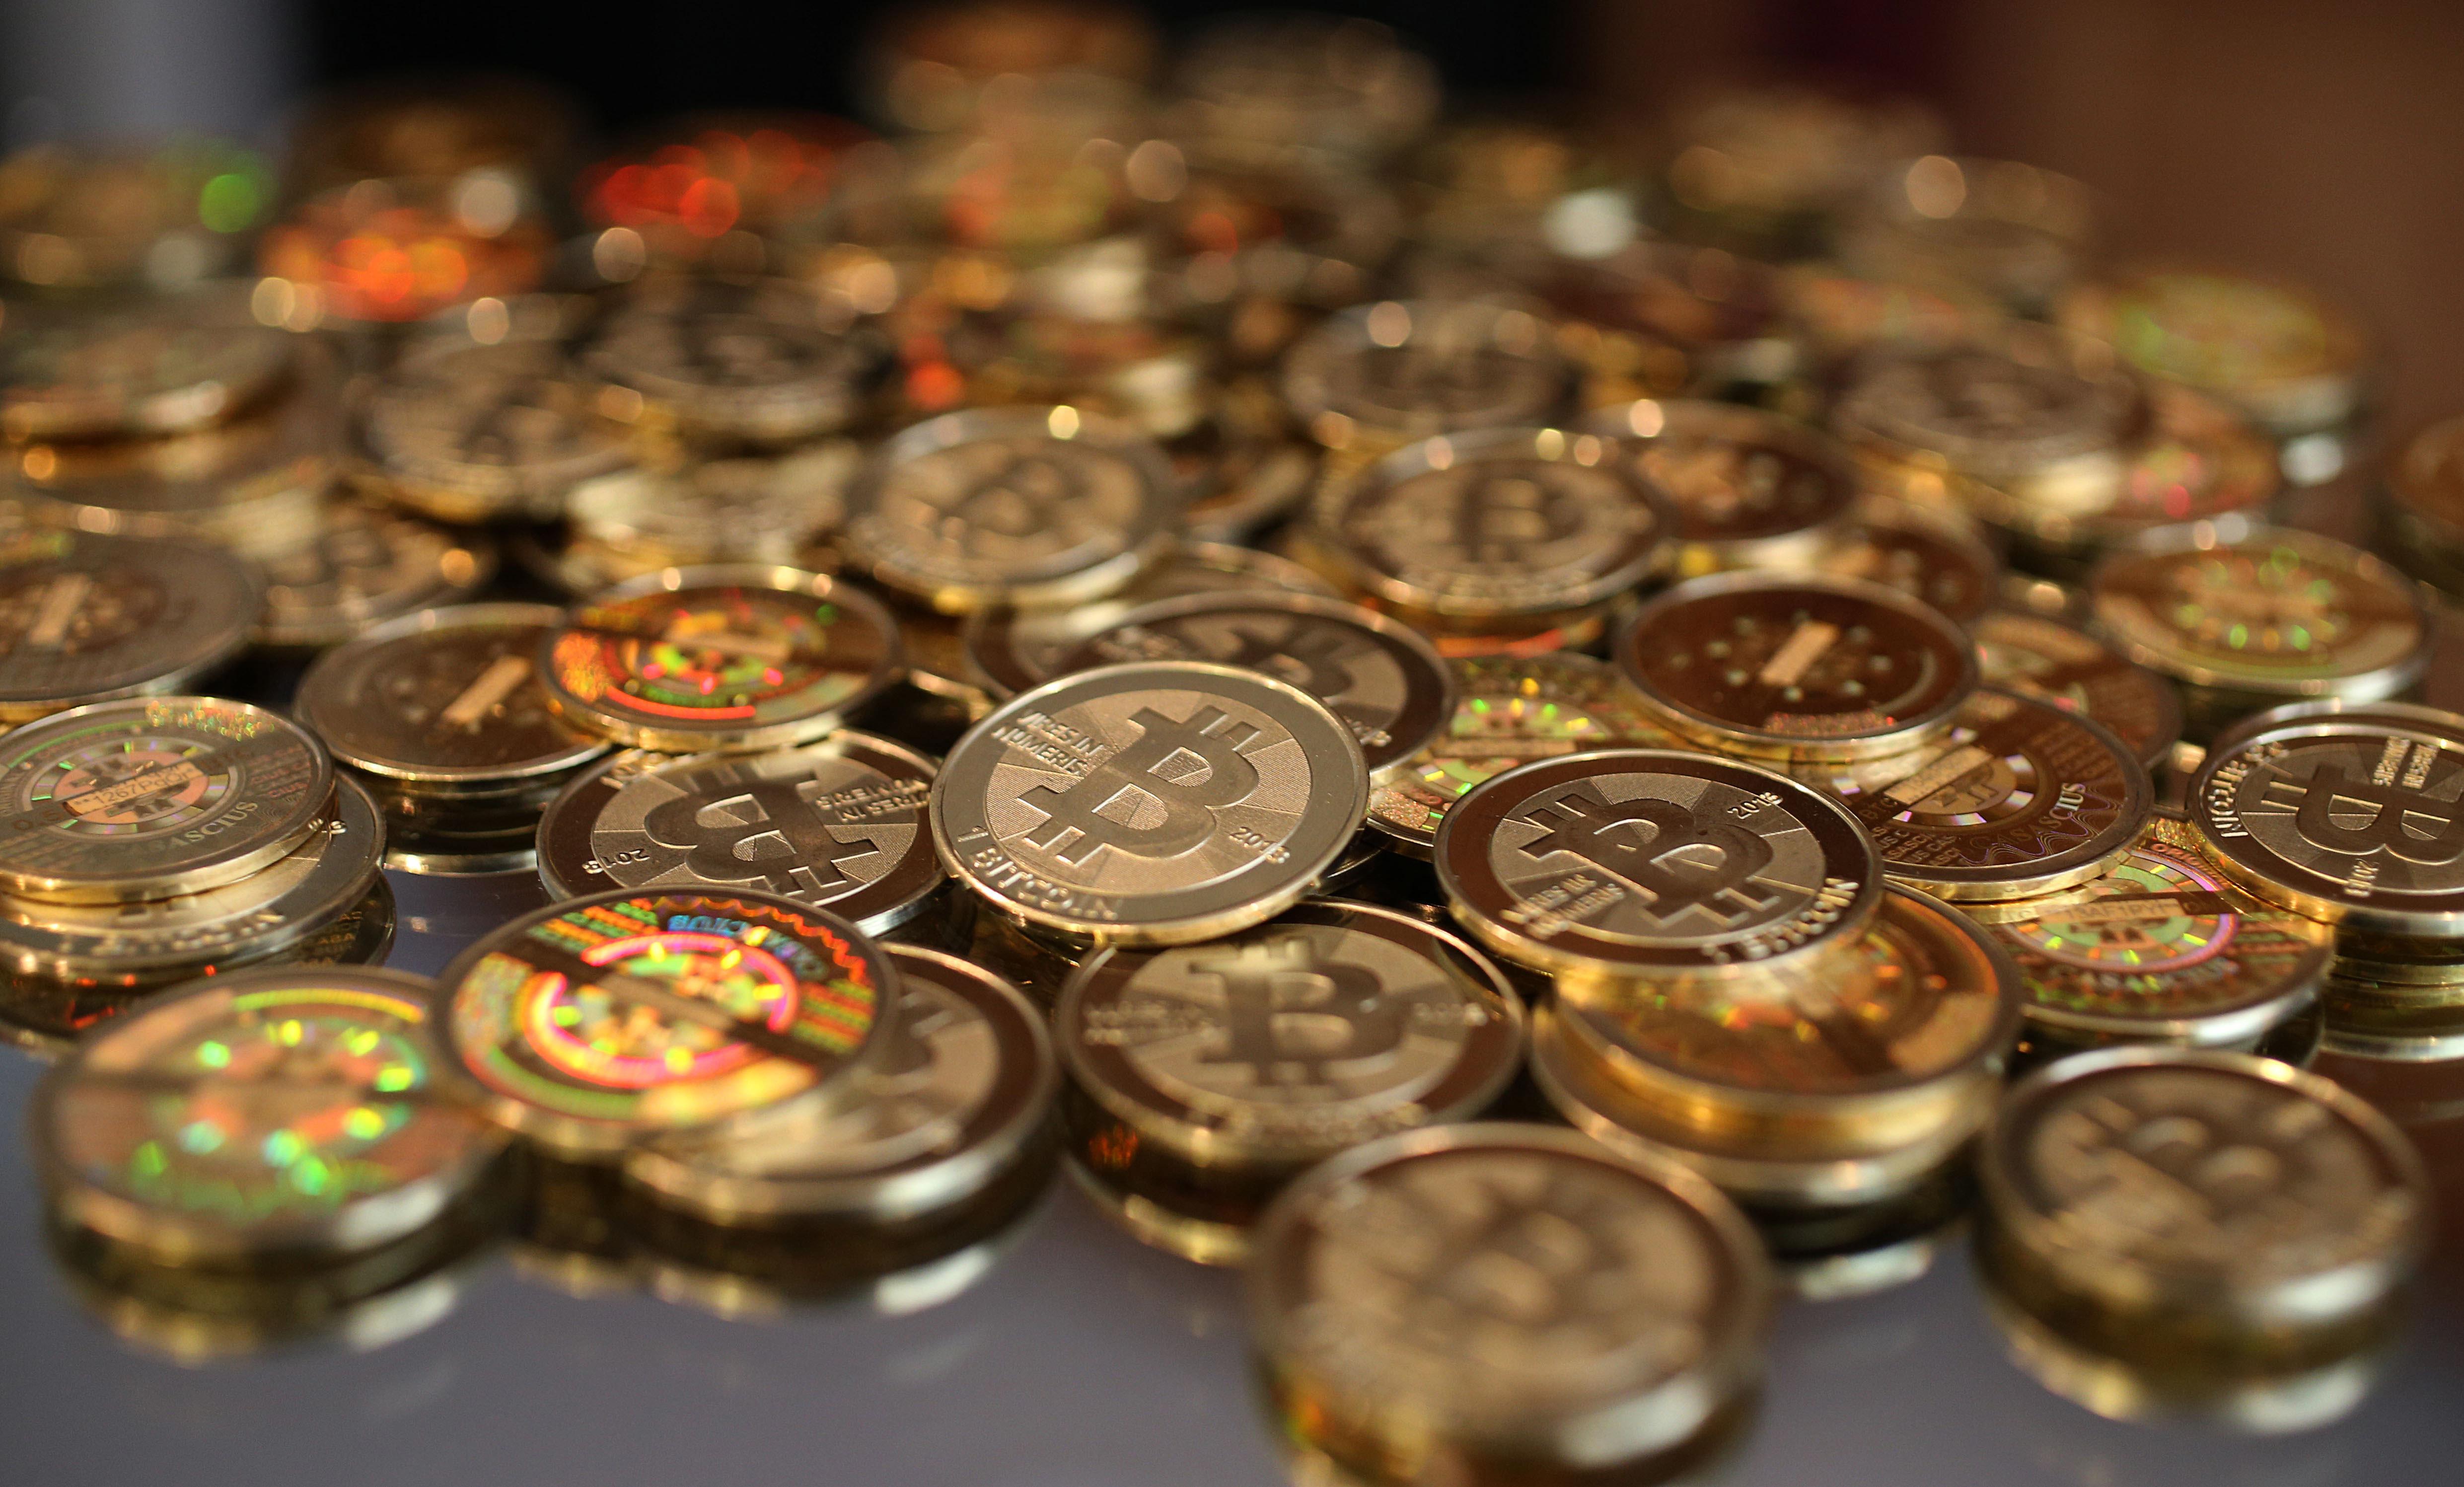 A pile of Bitcoins.